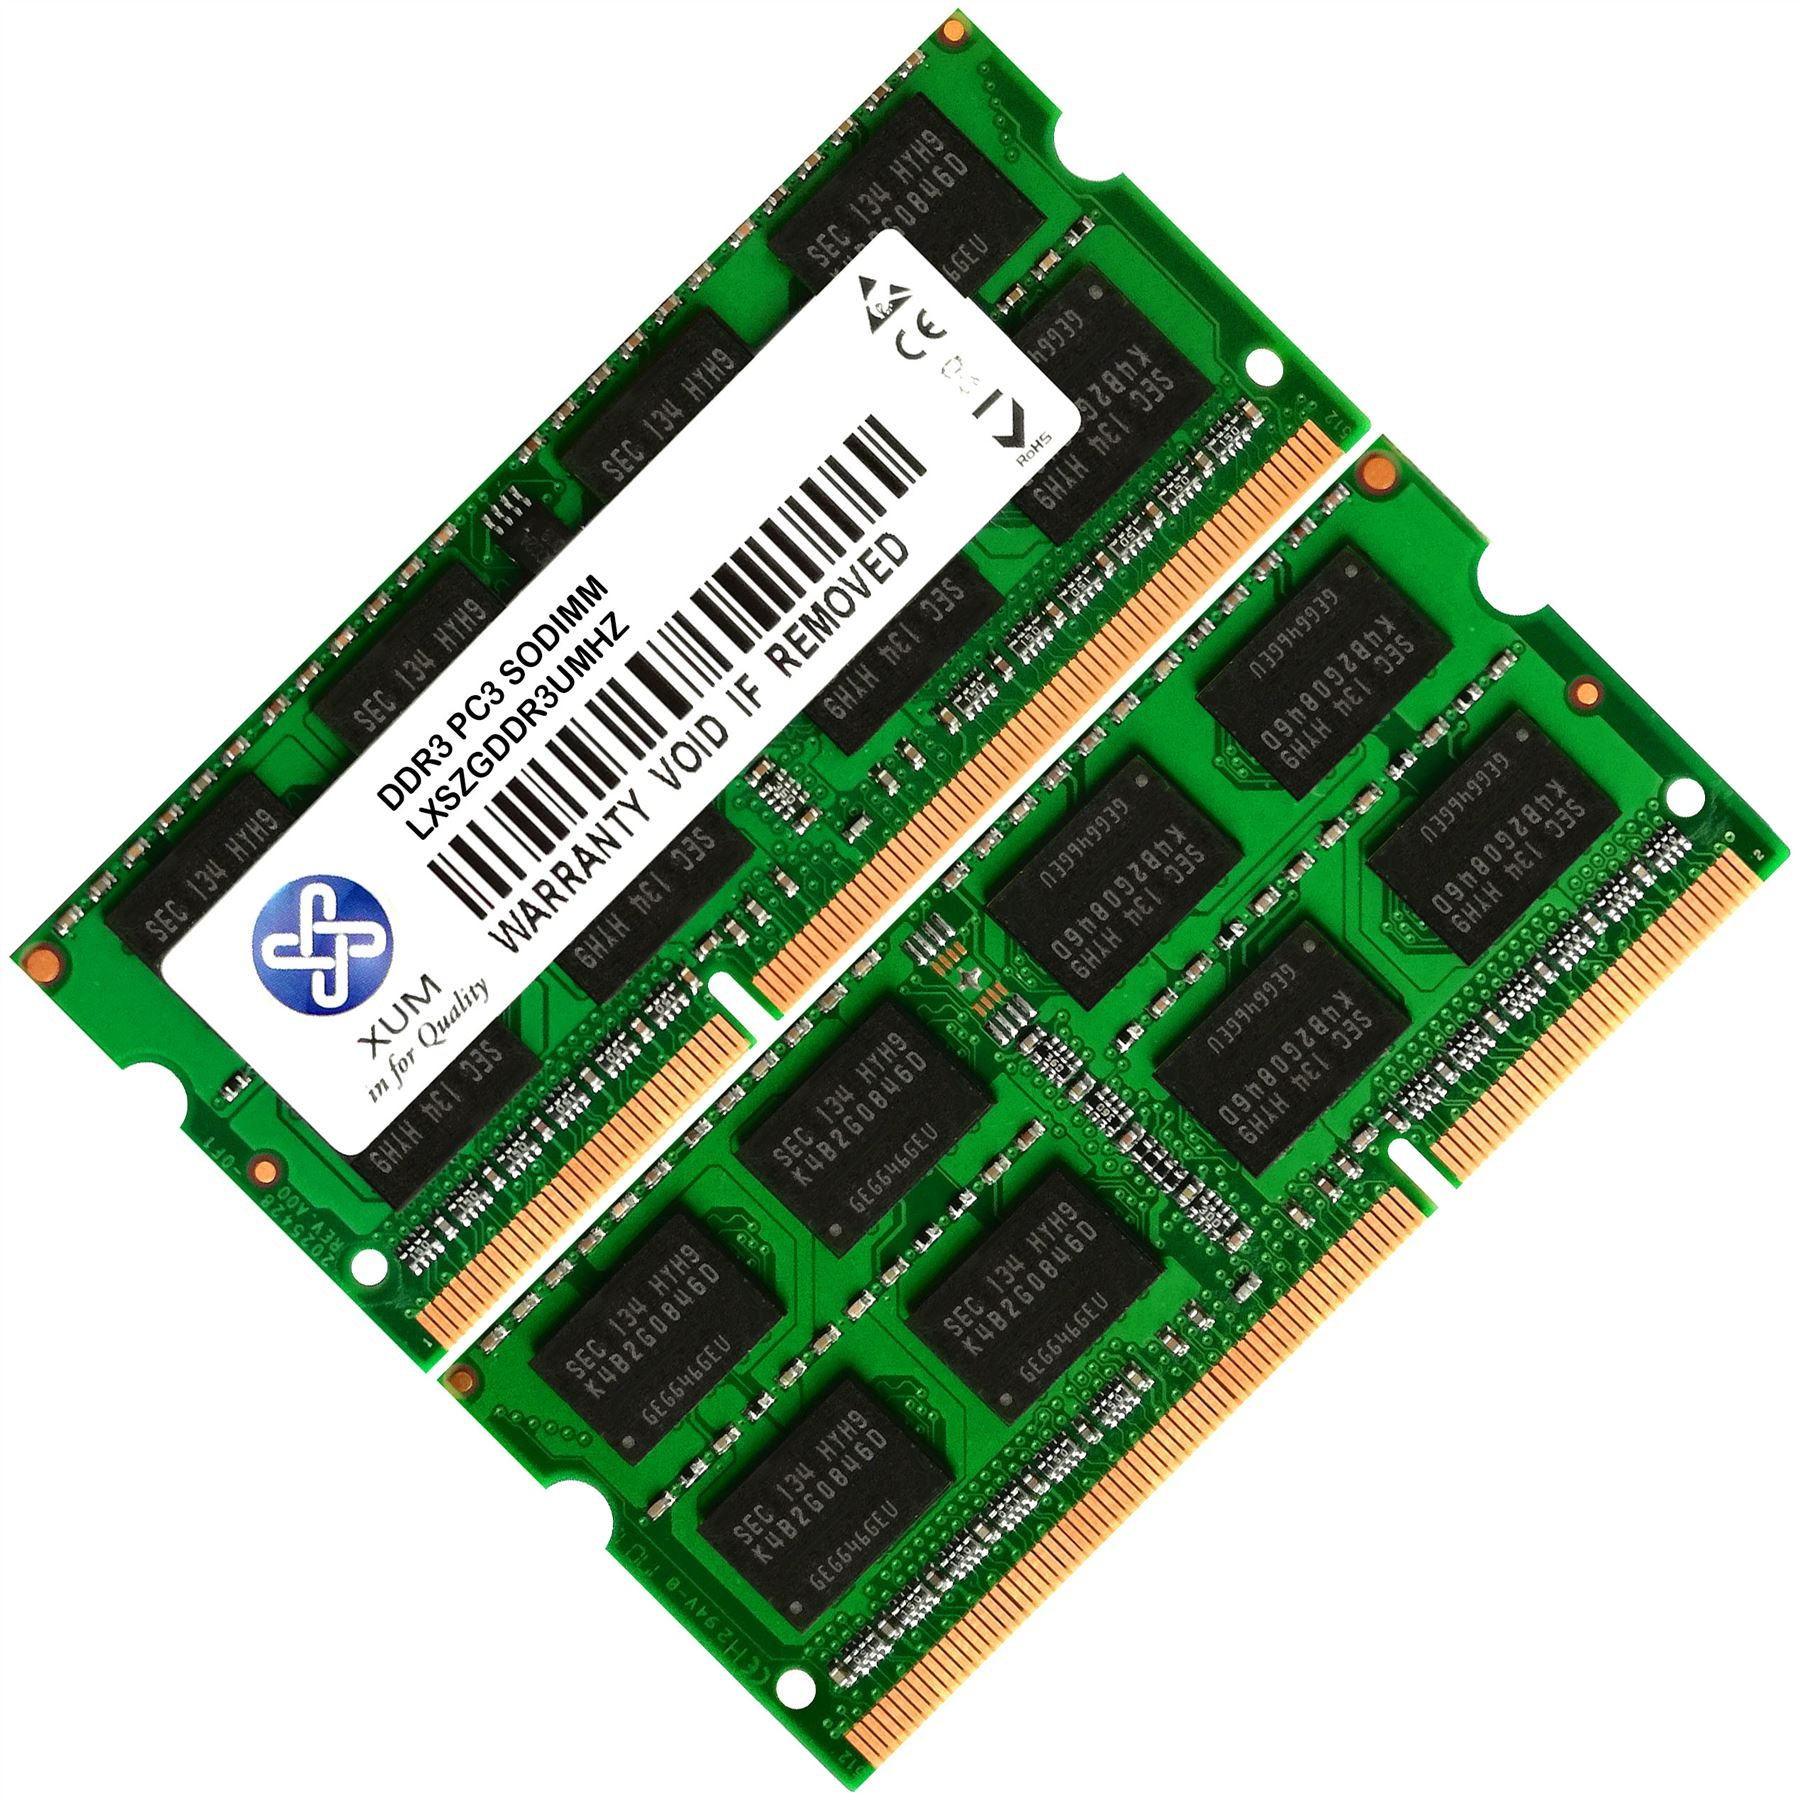 Memoria-Ram-4-Hp-Pavilion-All-in-One-Laptop-20-b051la-20-b052la-Nuevo-2x-Lot